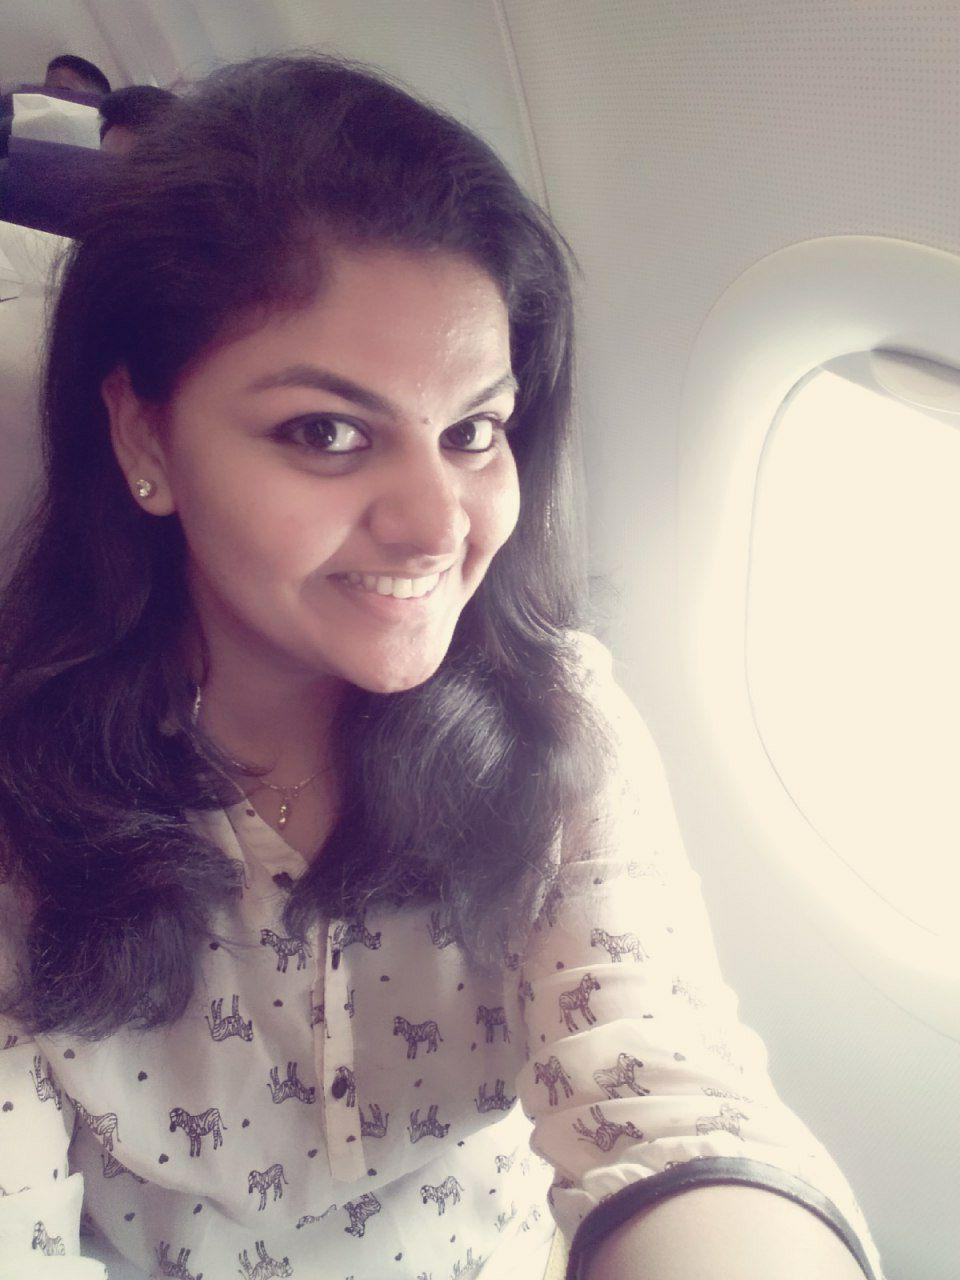 Gajalakshme 😜 - Coffee LoverTikTok and selfie expert. Has a hard time crossing the road.